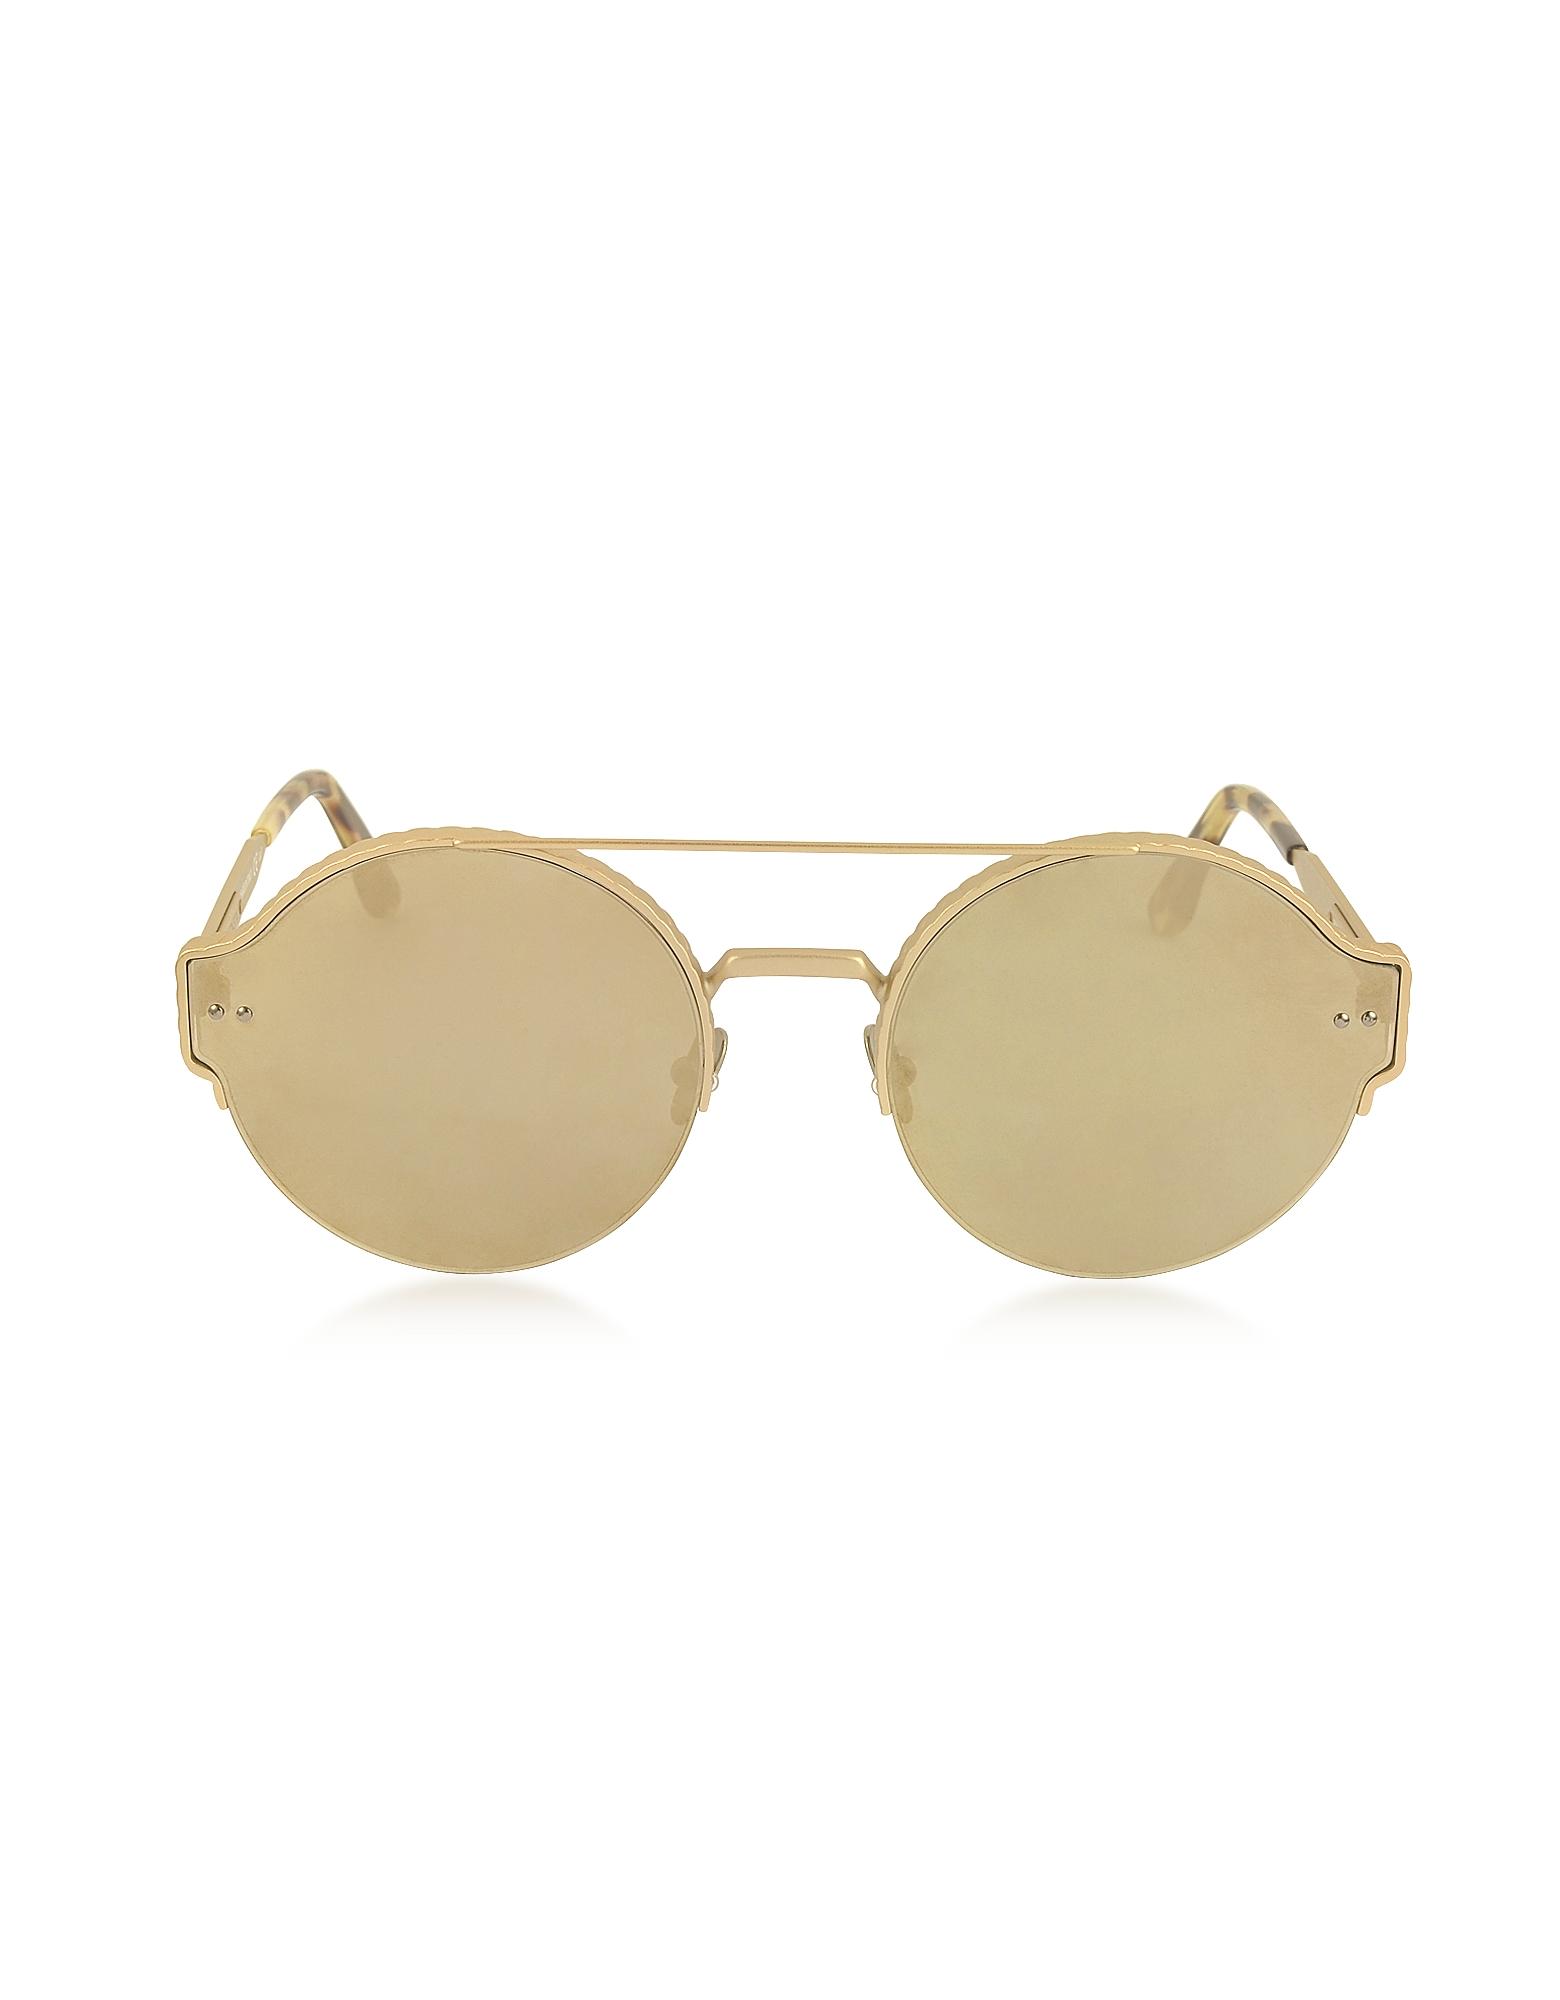 Bottega Veneta Designer Sunglasses, BV0013S Round Metal Frame Unisex Sunglasses